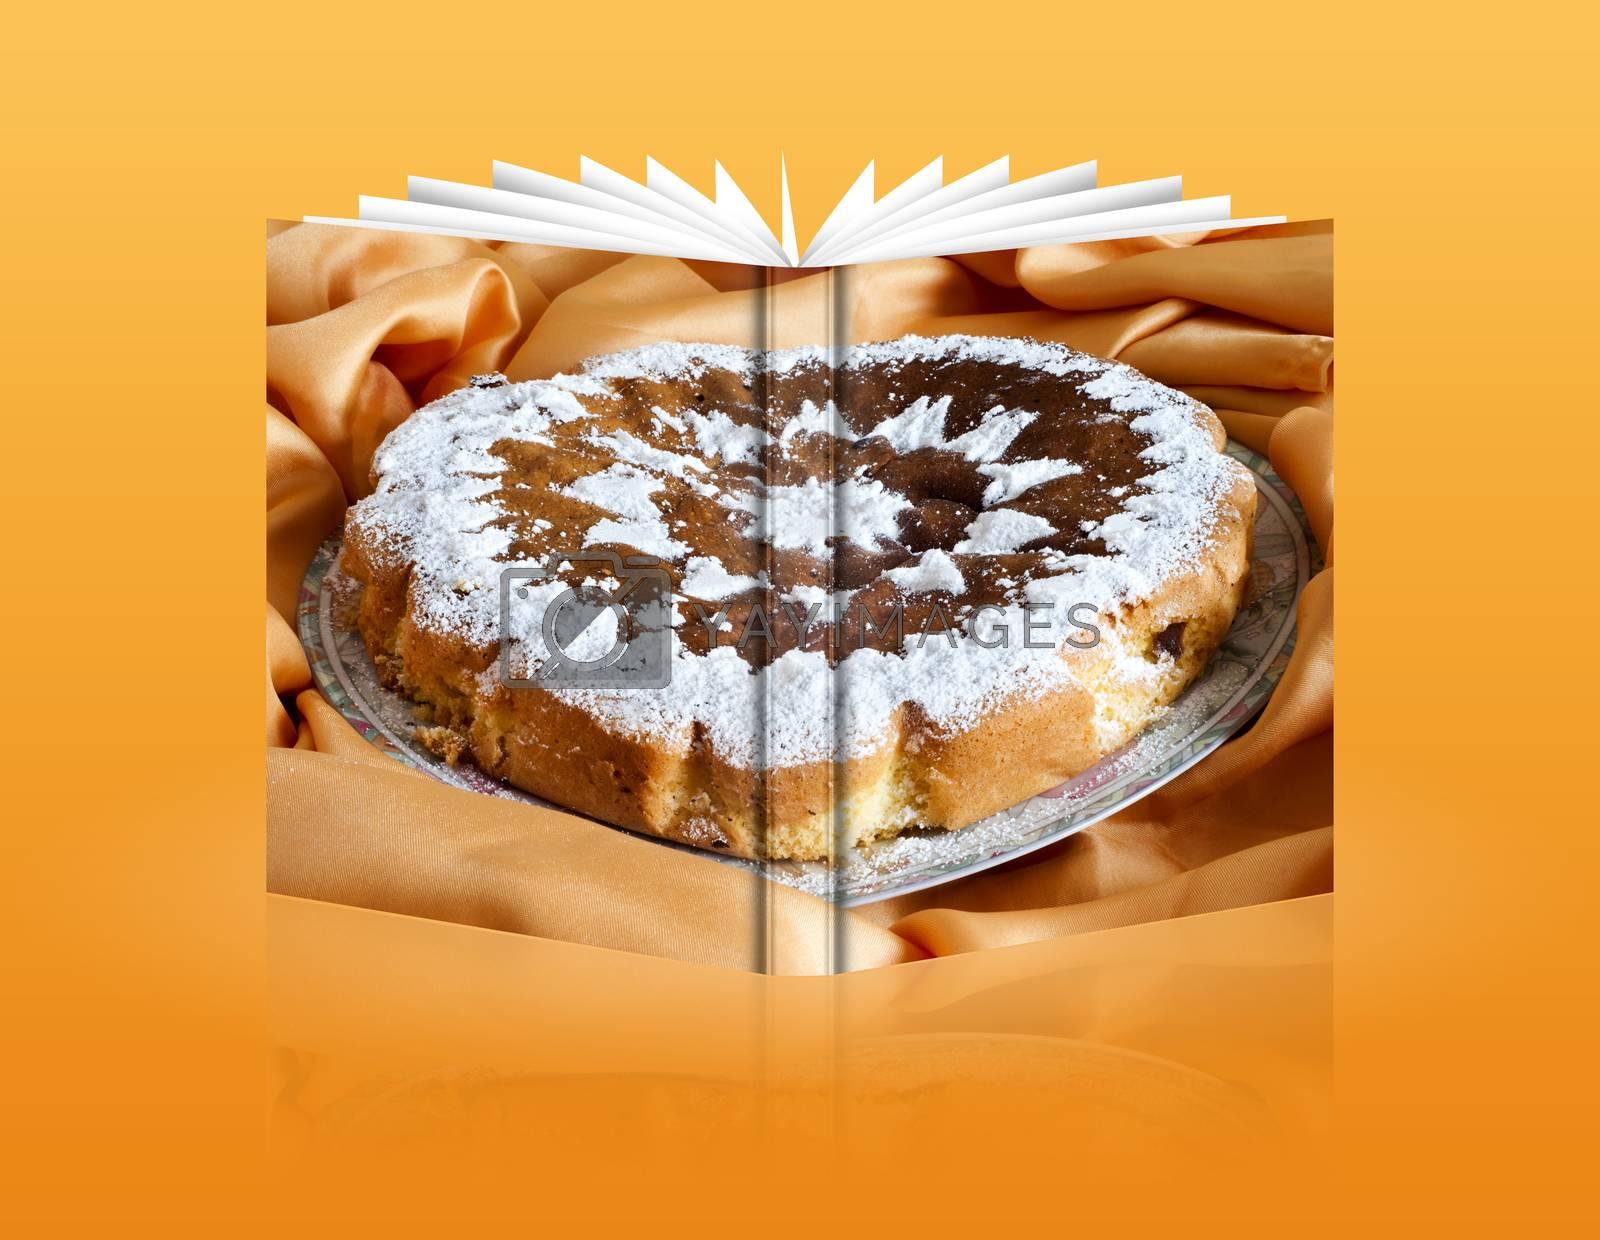 a book of an orange homemade cake